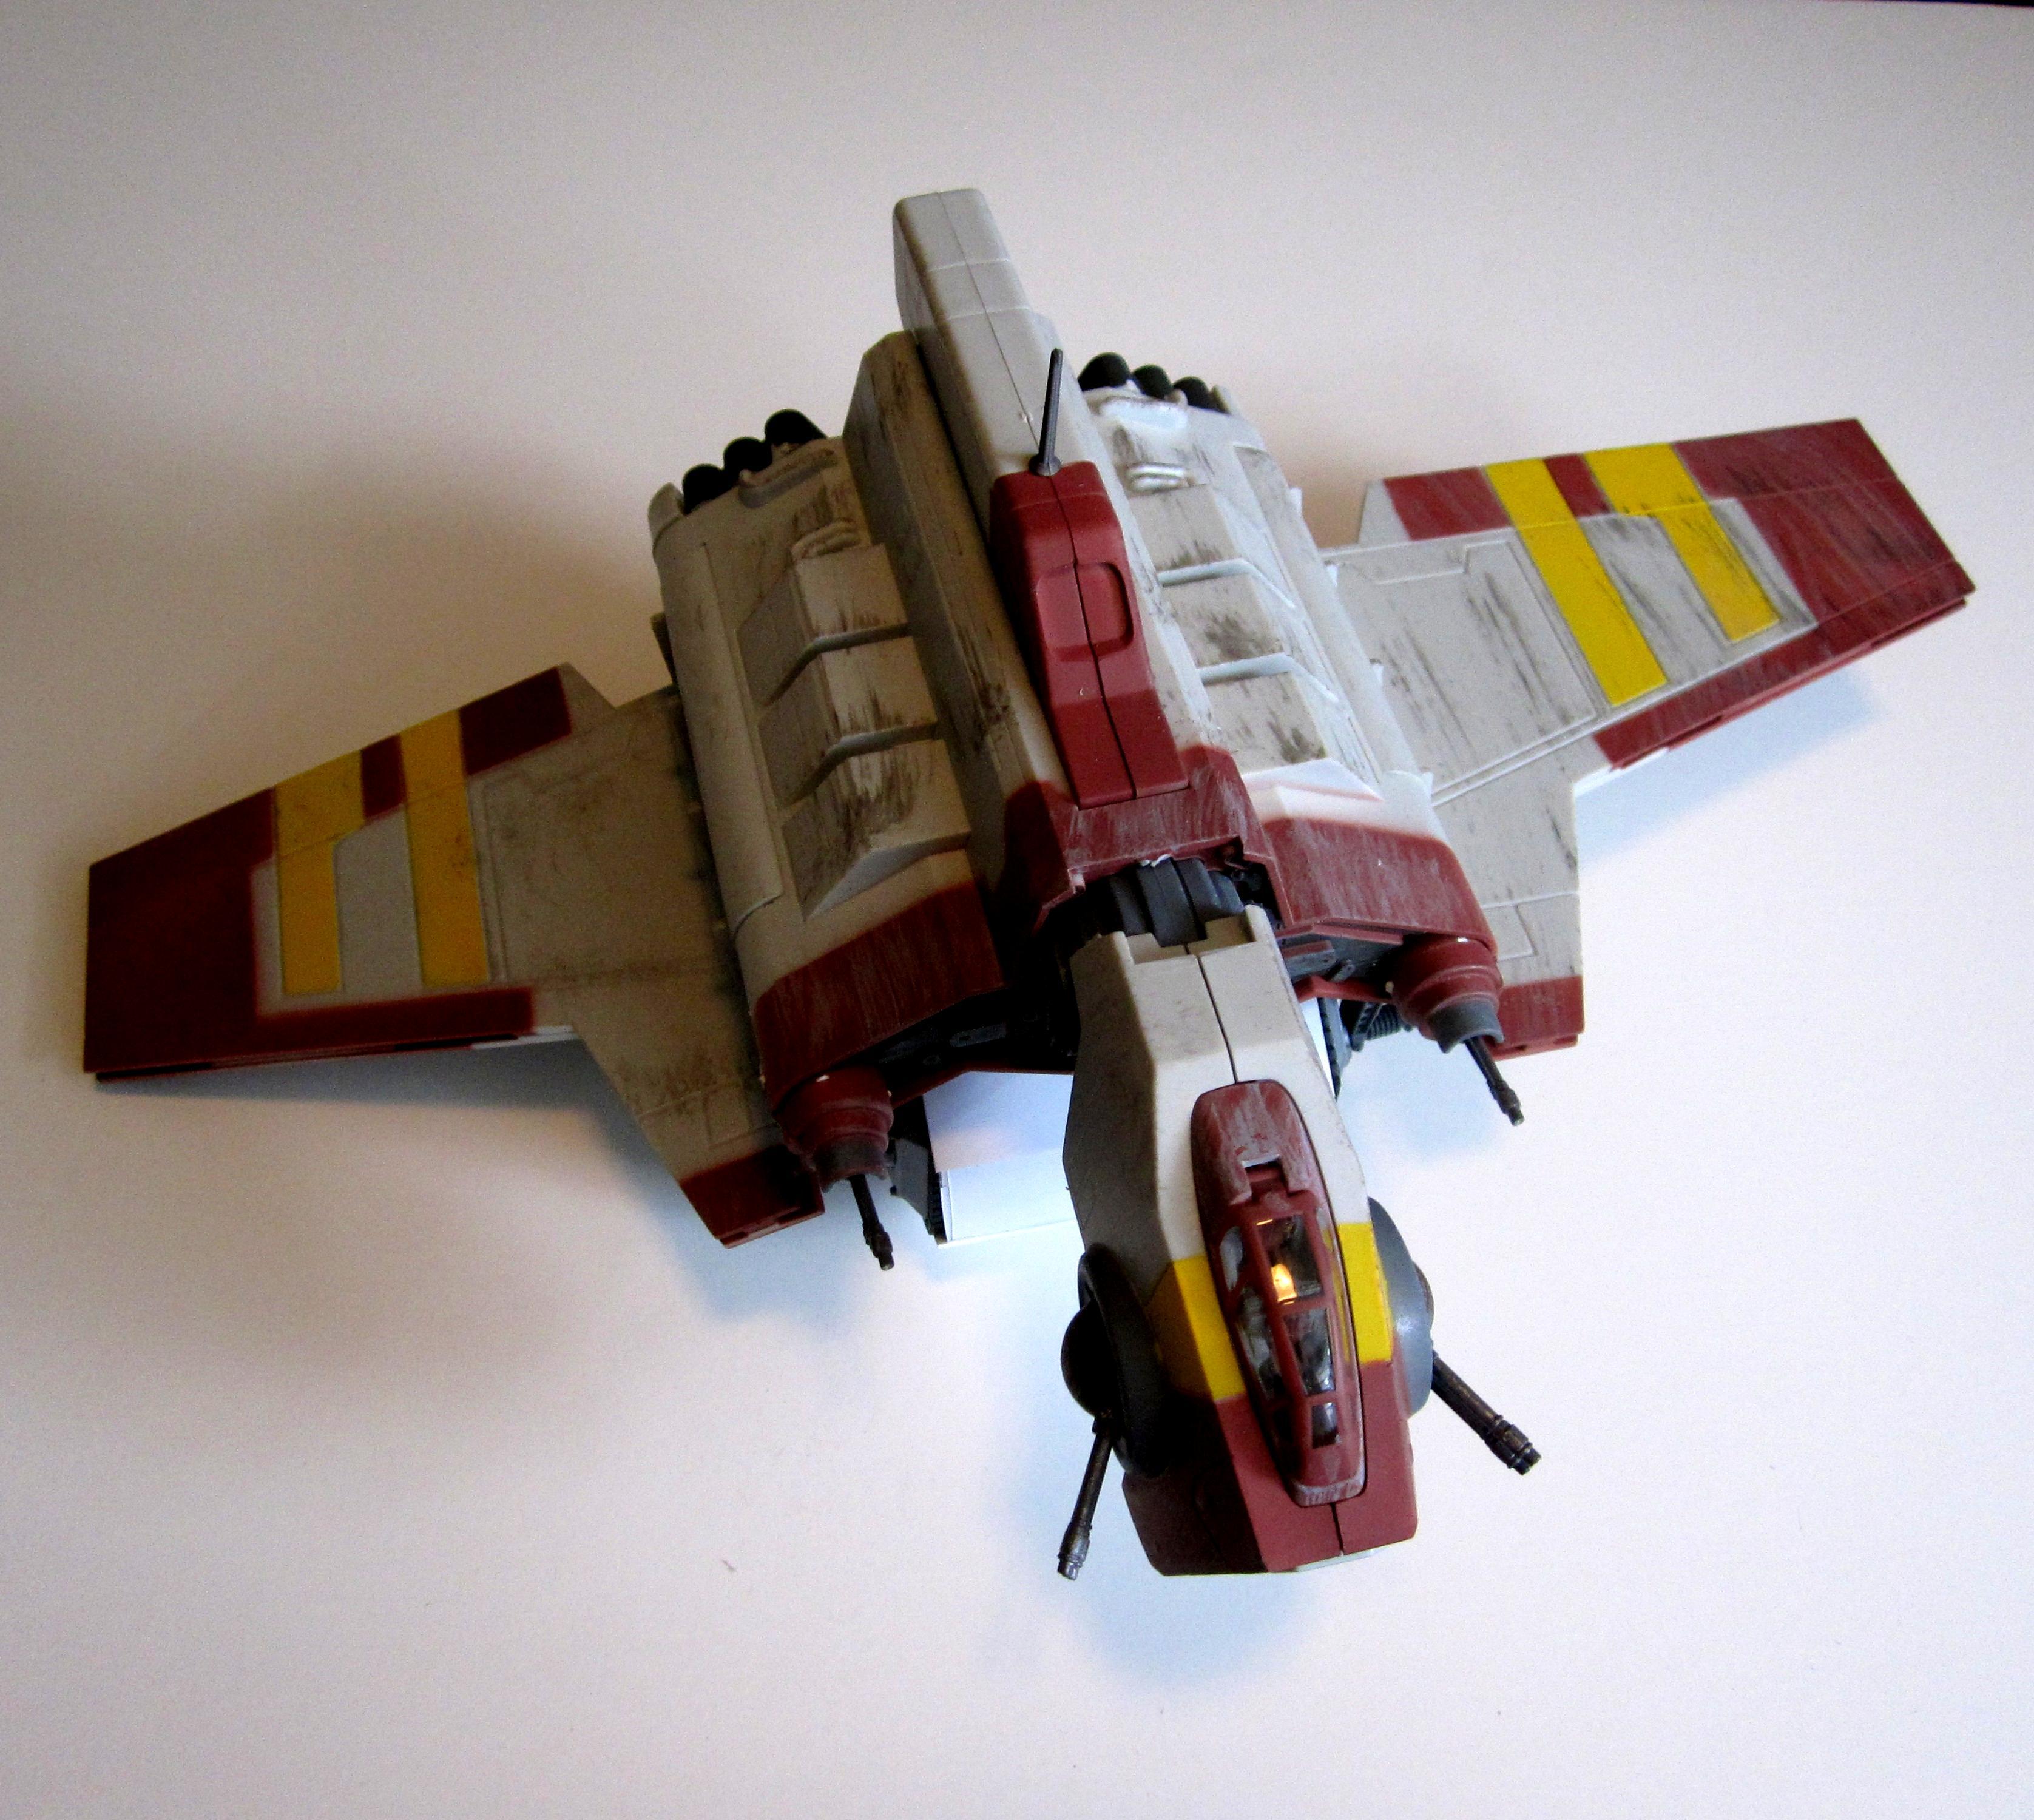 Drop Ship, Flyer, Lander, Shuttle, Star Wars, Storm Raven